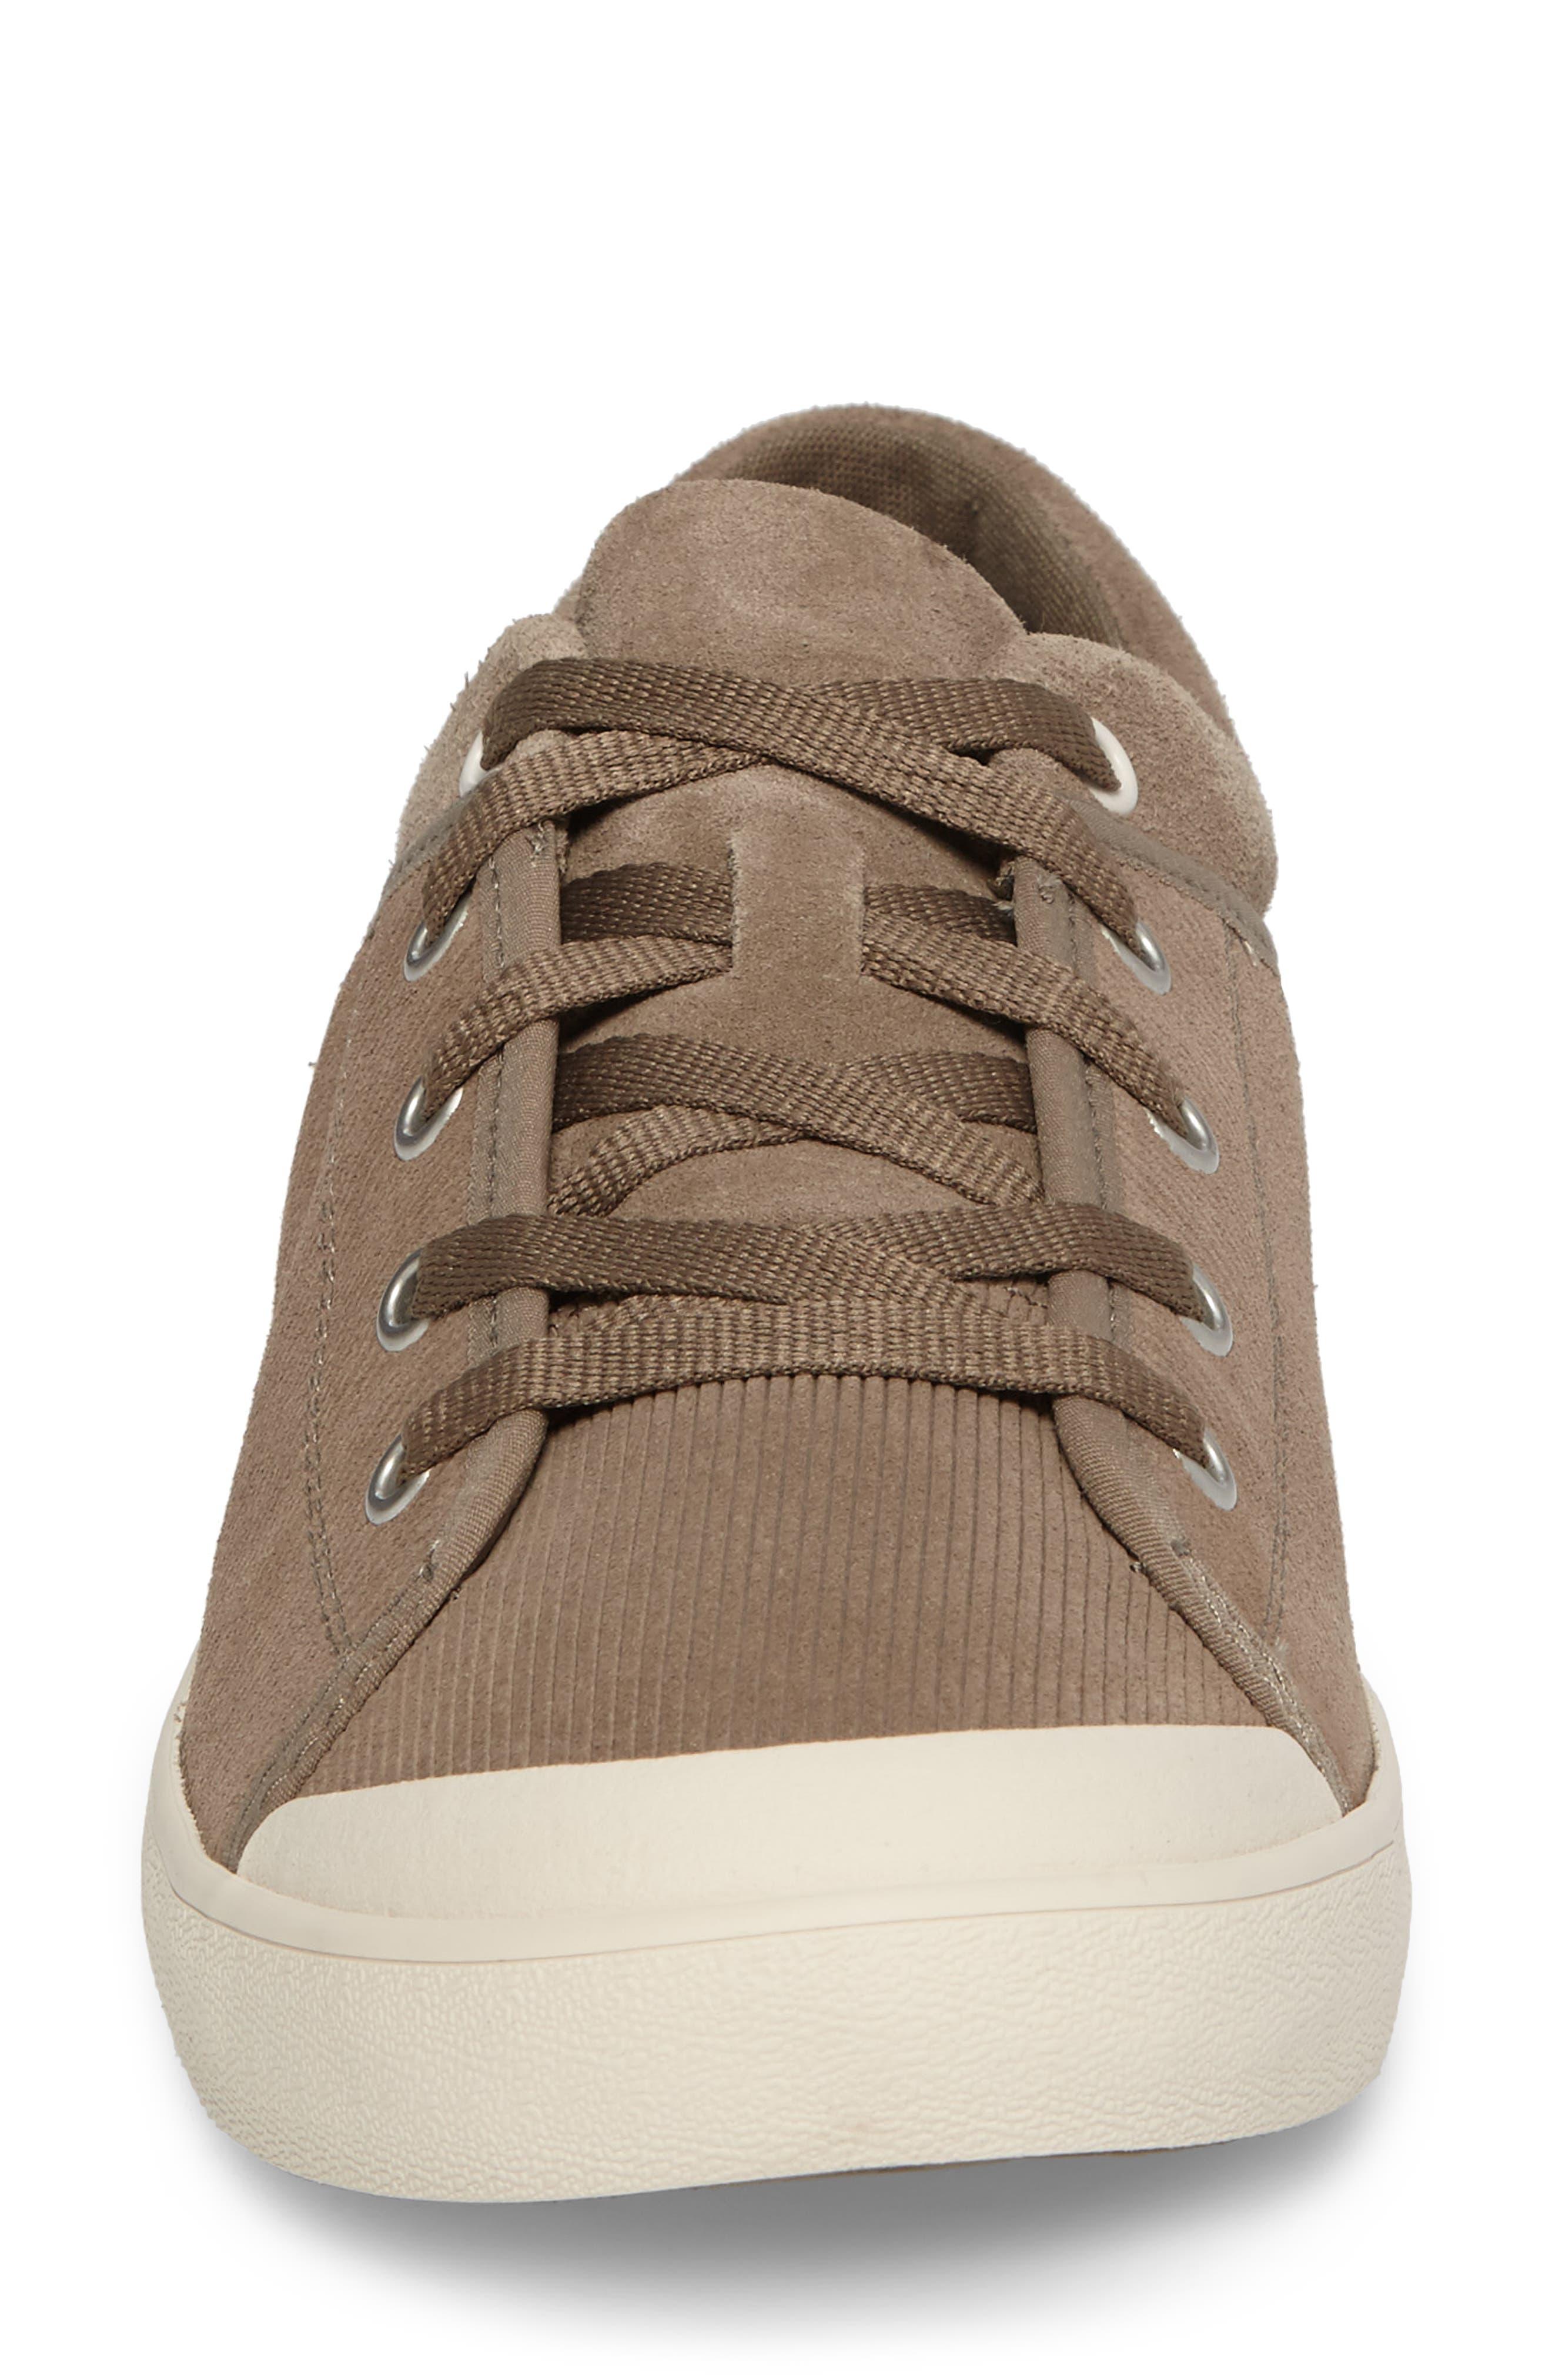 Freewheel Sneaker,                             Alternate thumbnail 4, color,                             240